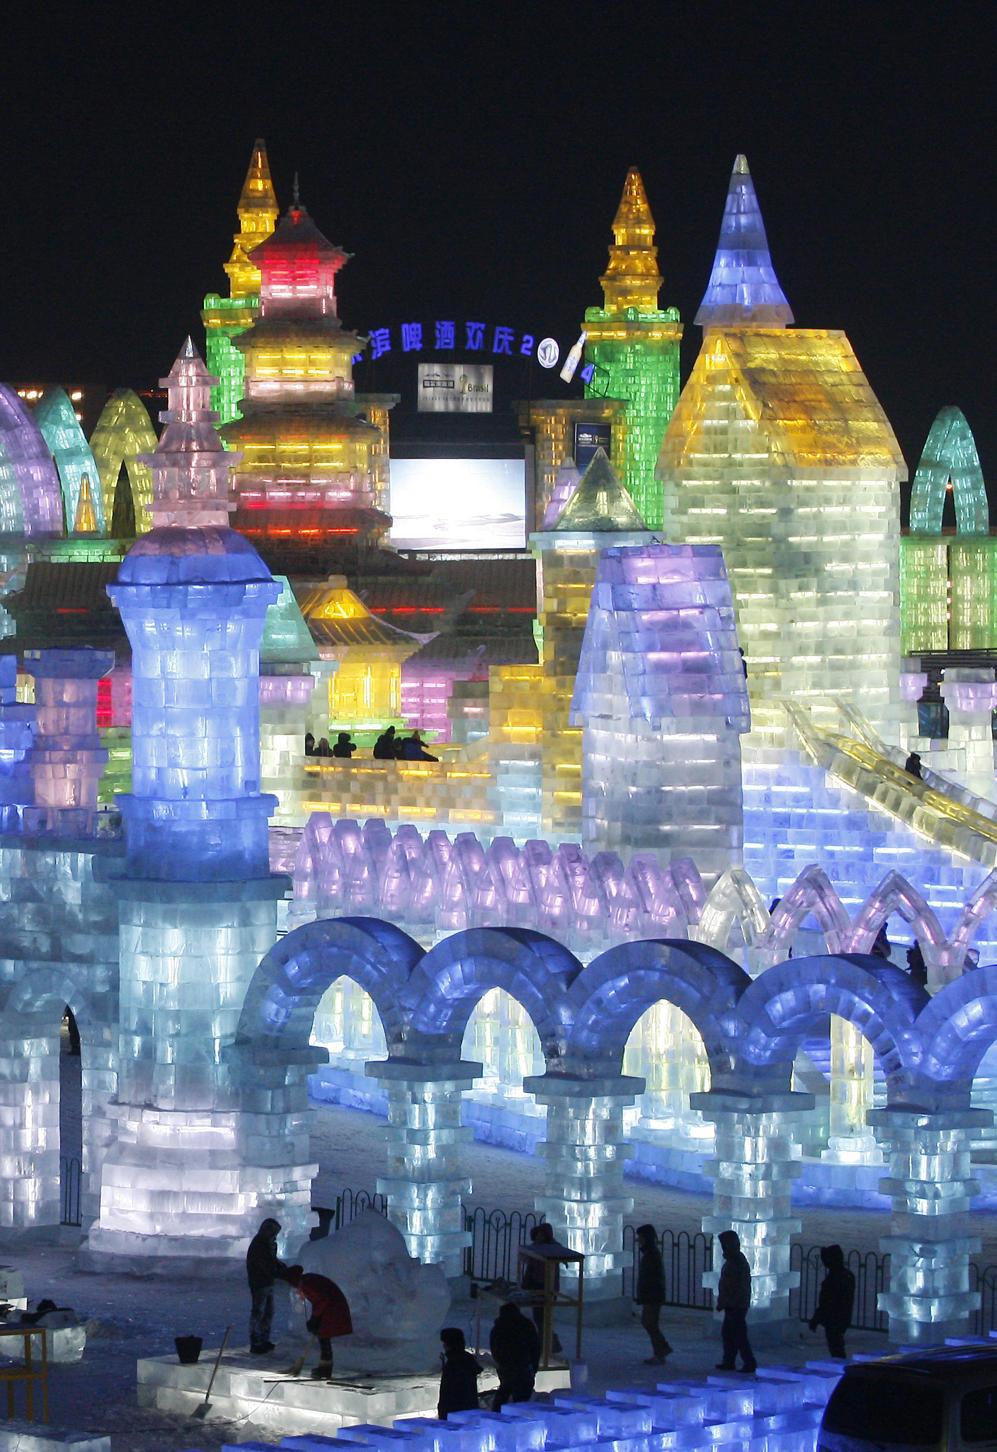 s 30th Harbin International Ice and Snow Sculpture